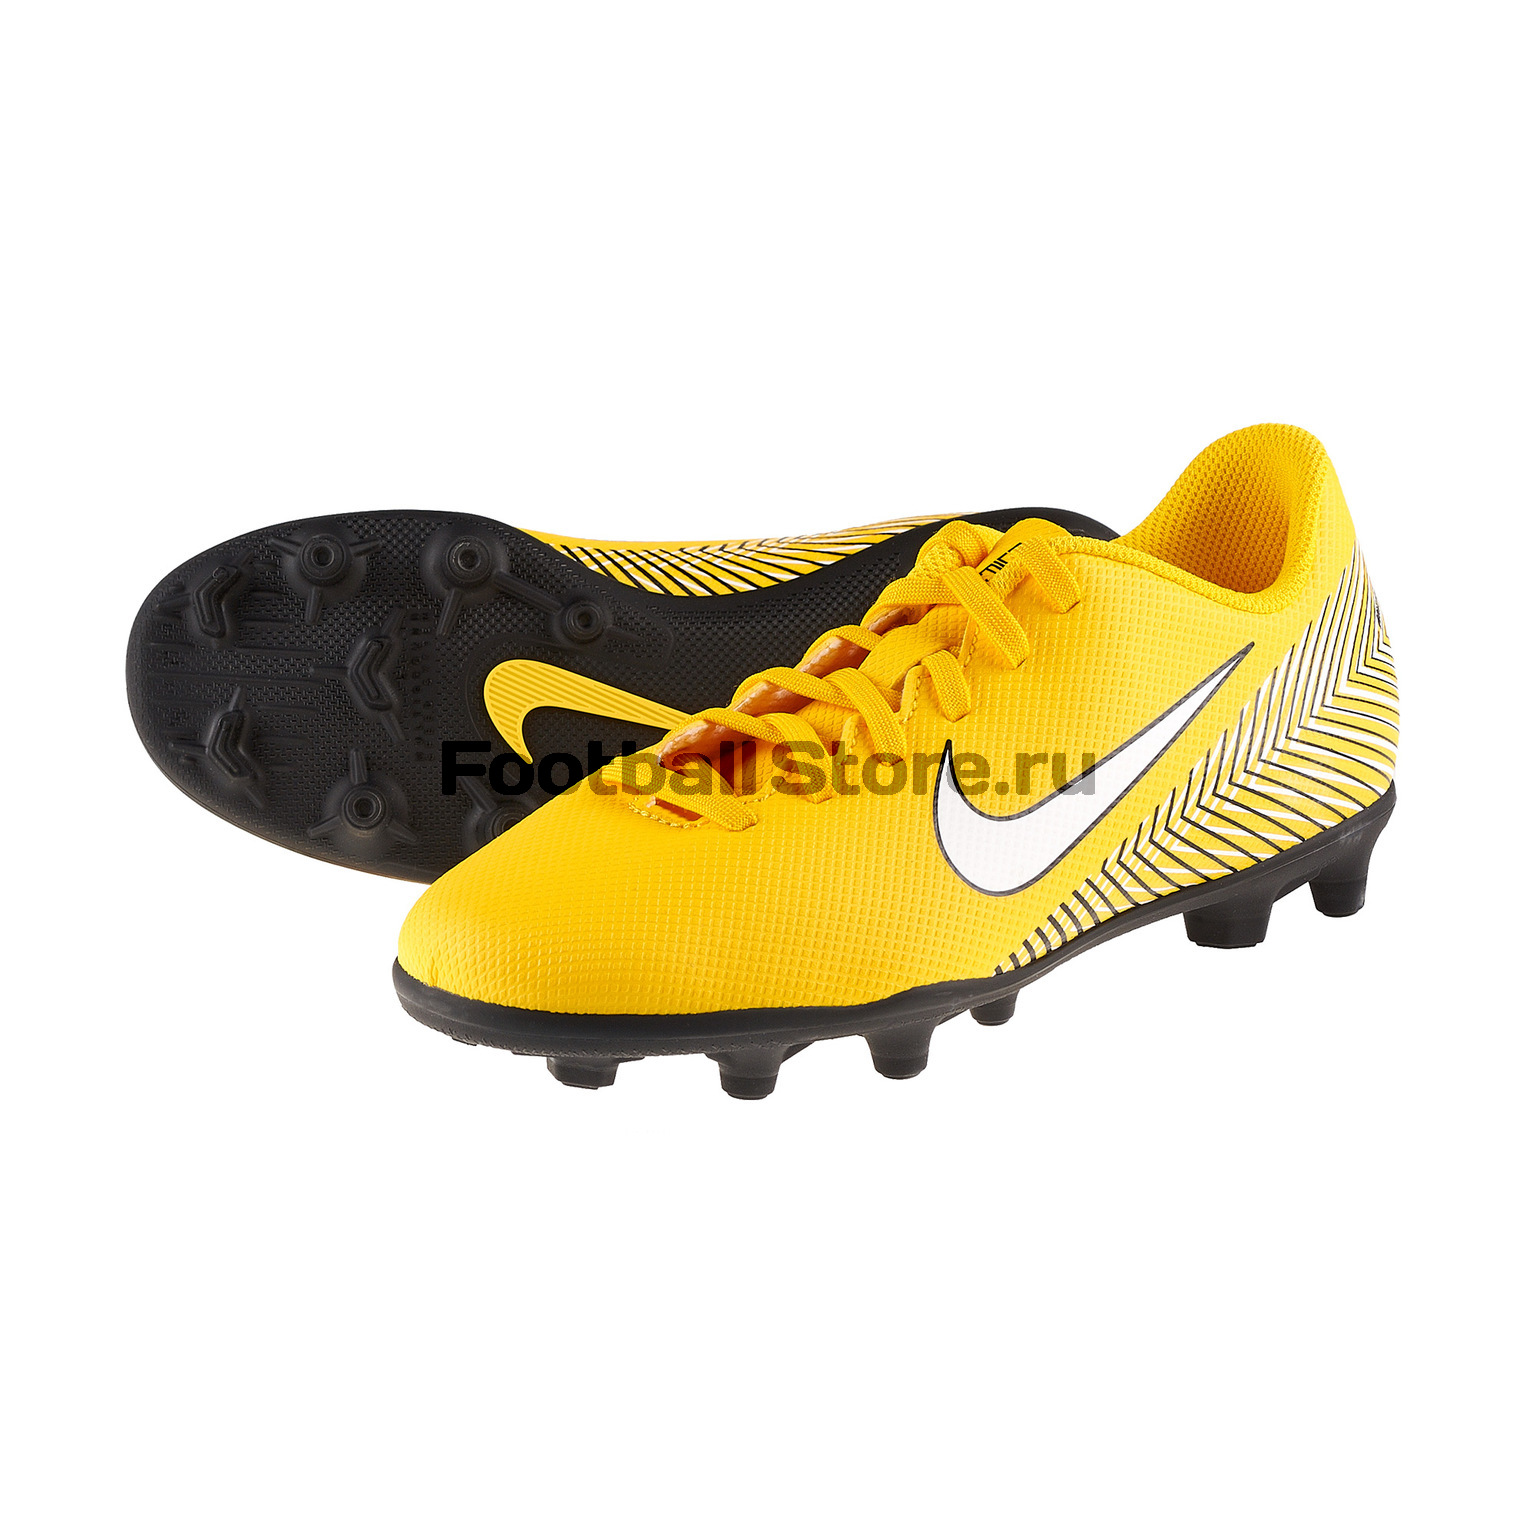 Бутсы детские Nike Vapor 12 Club Neymar FG/MG AO9472-710 бутсы nike superfly 6 elite sg pro ac ah7366 060